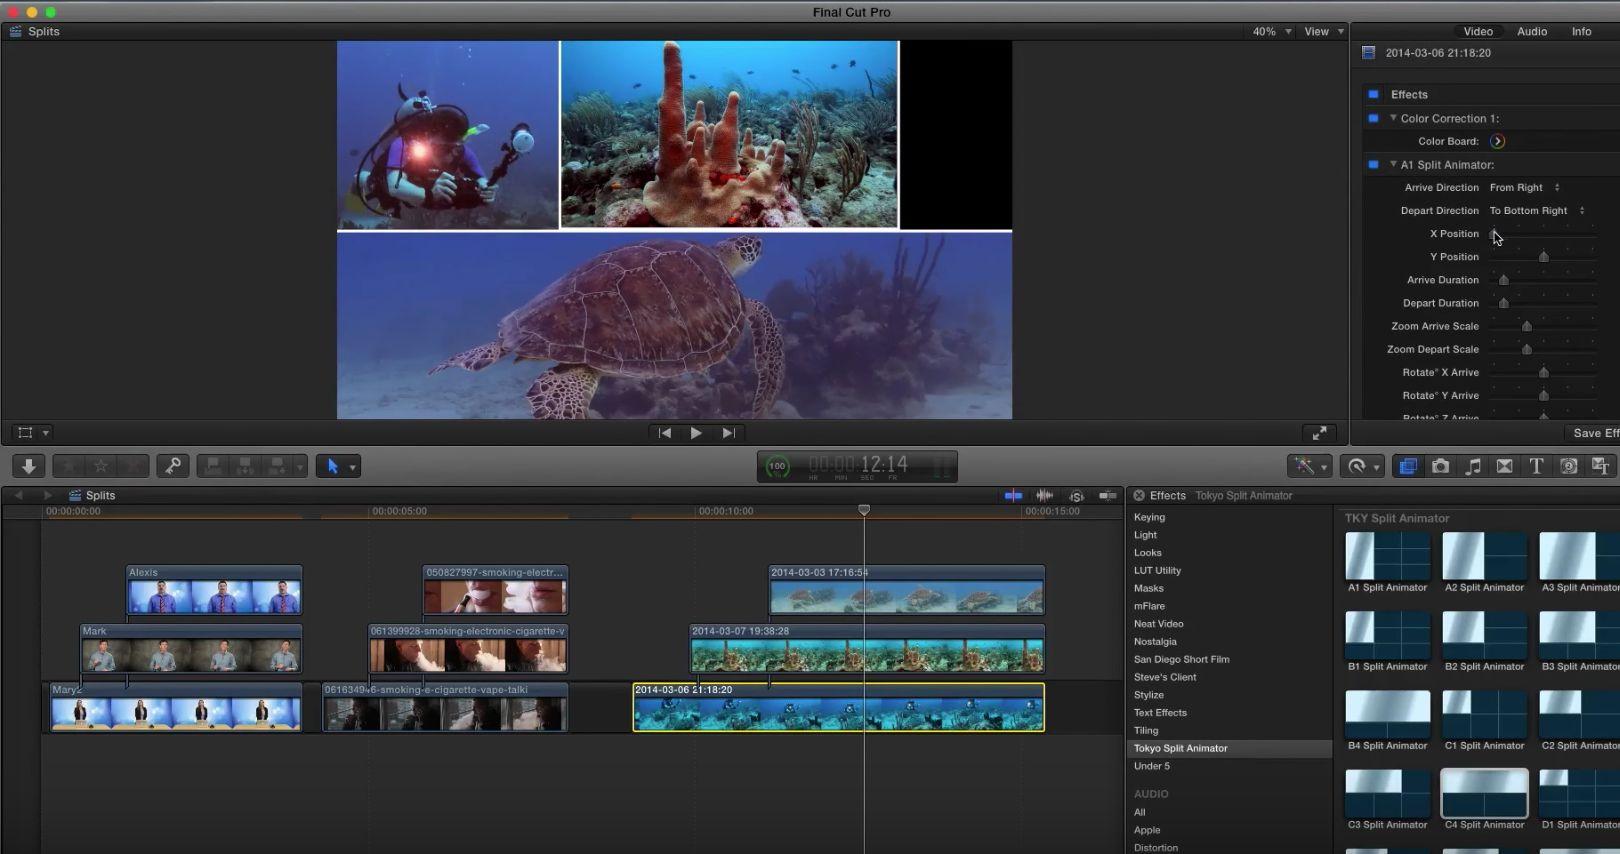 Tokyo Split Animator for Final Cut Pro X 11